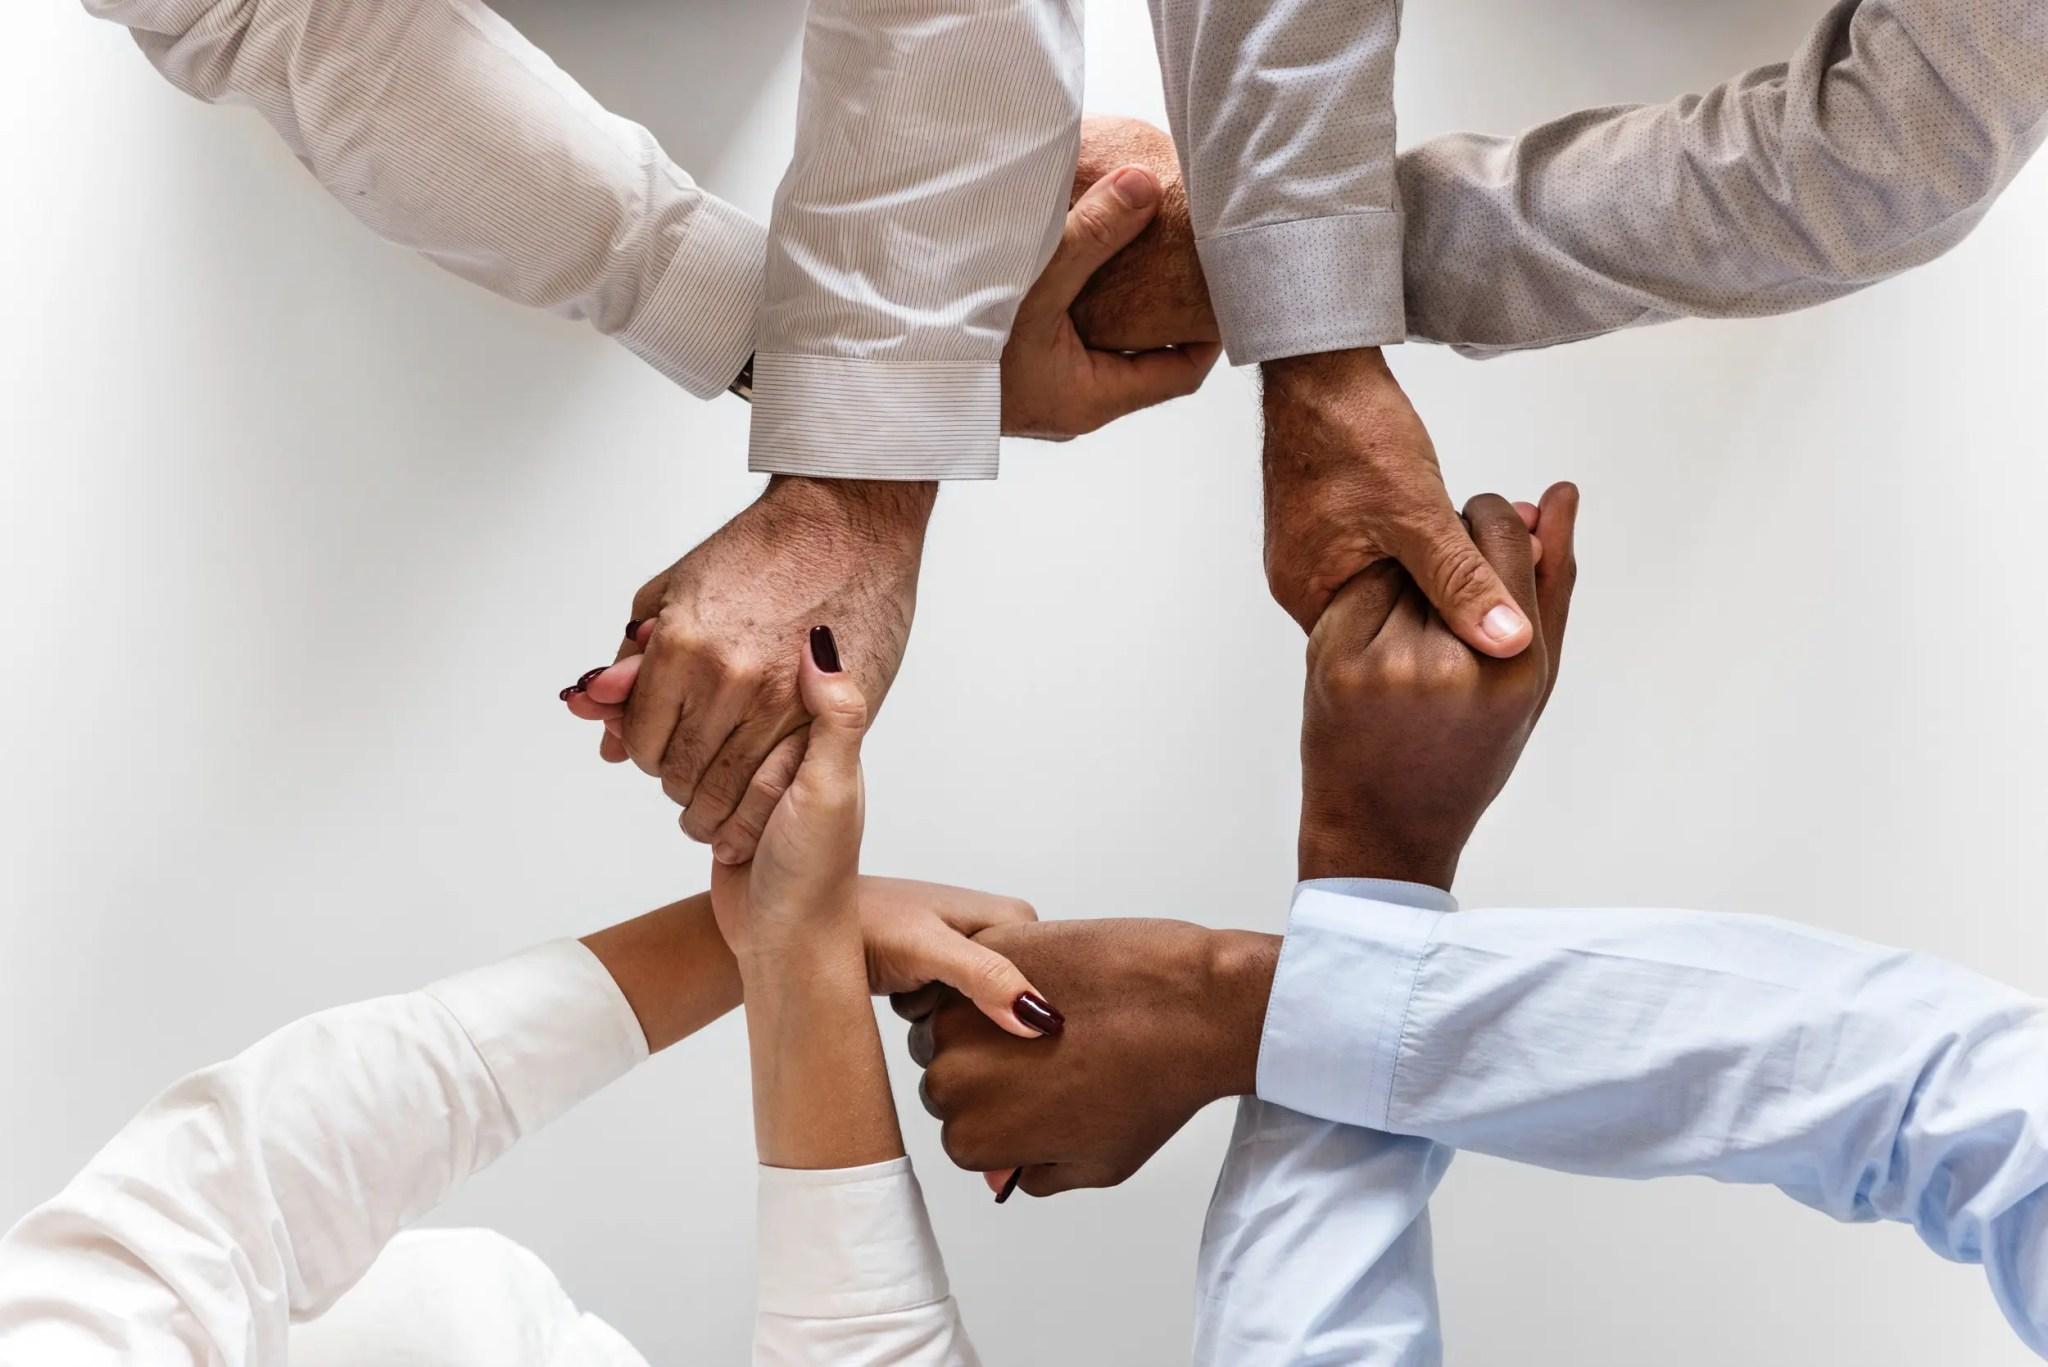 technical GDPR staff training essentials feature image